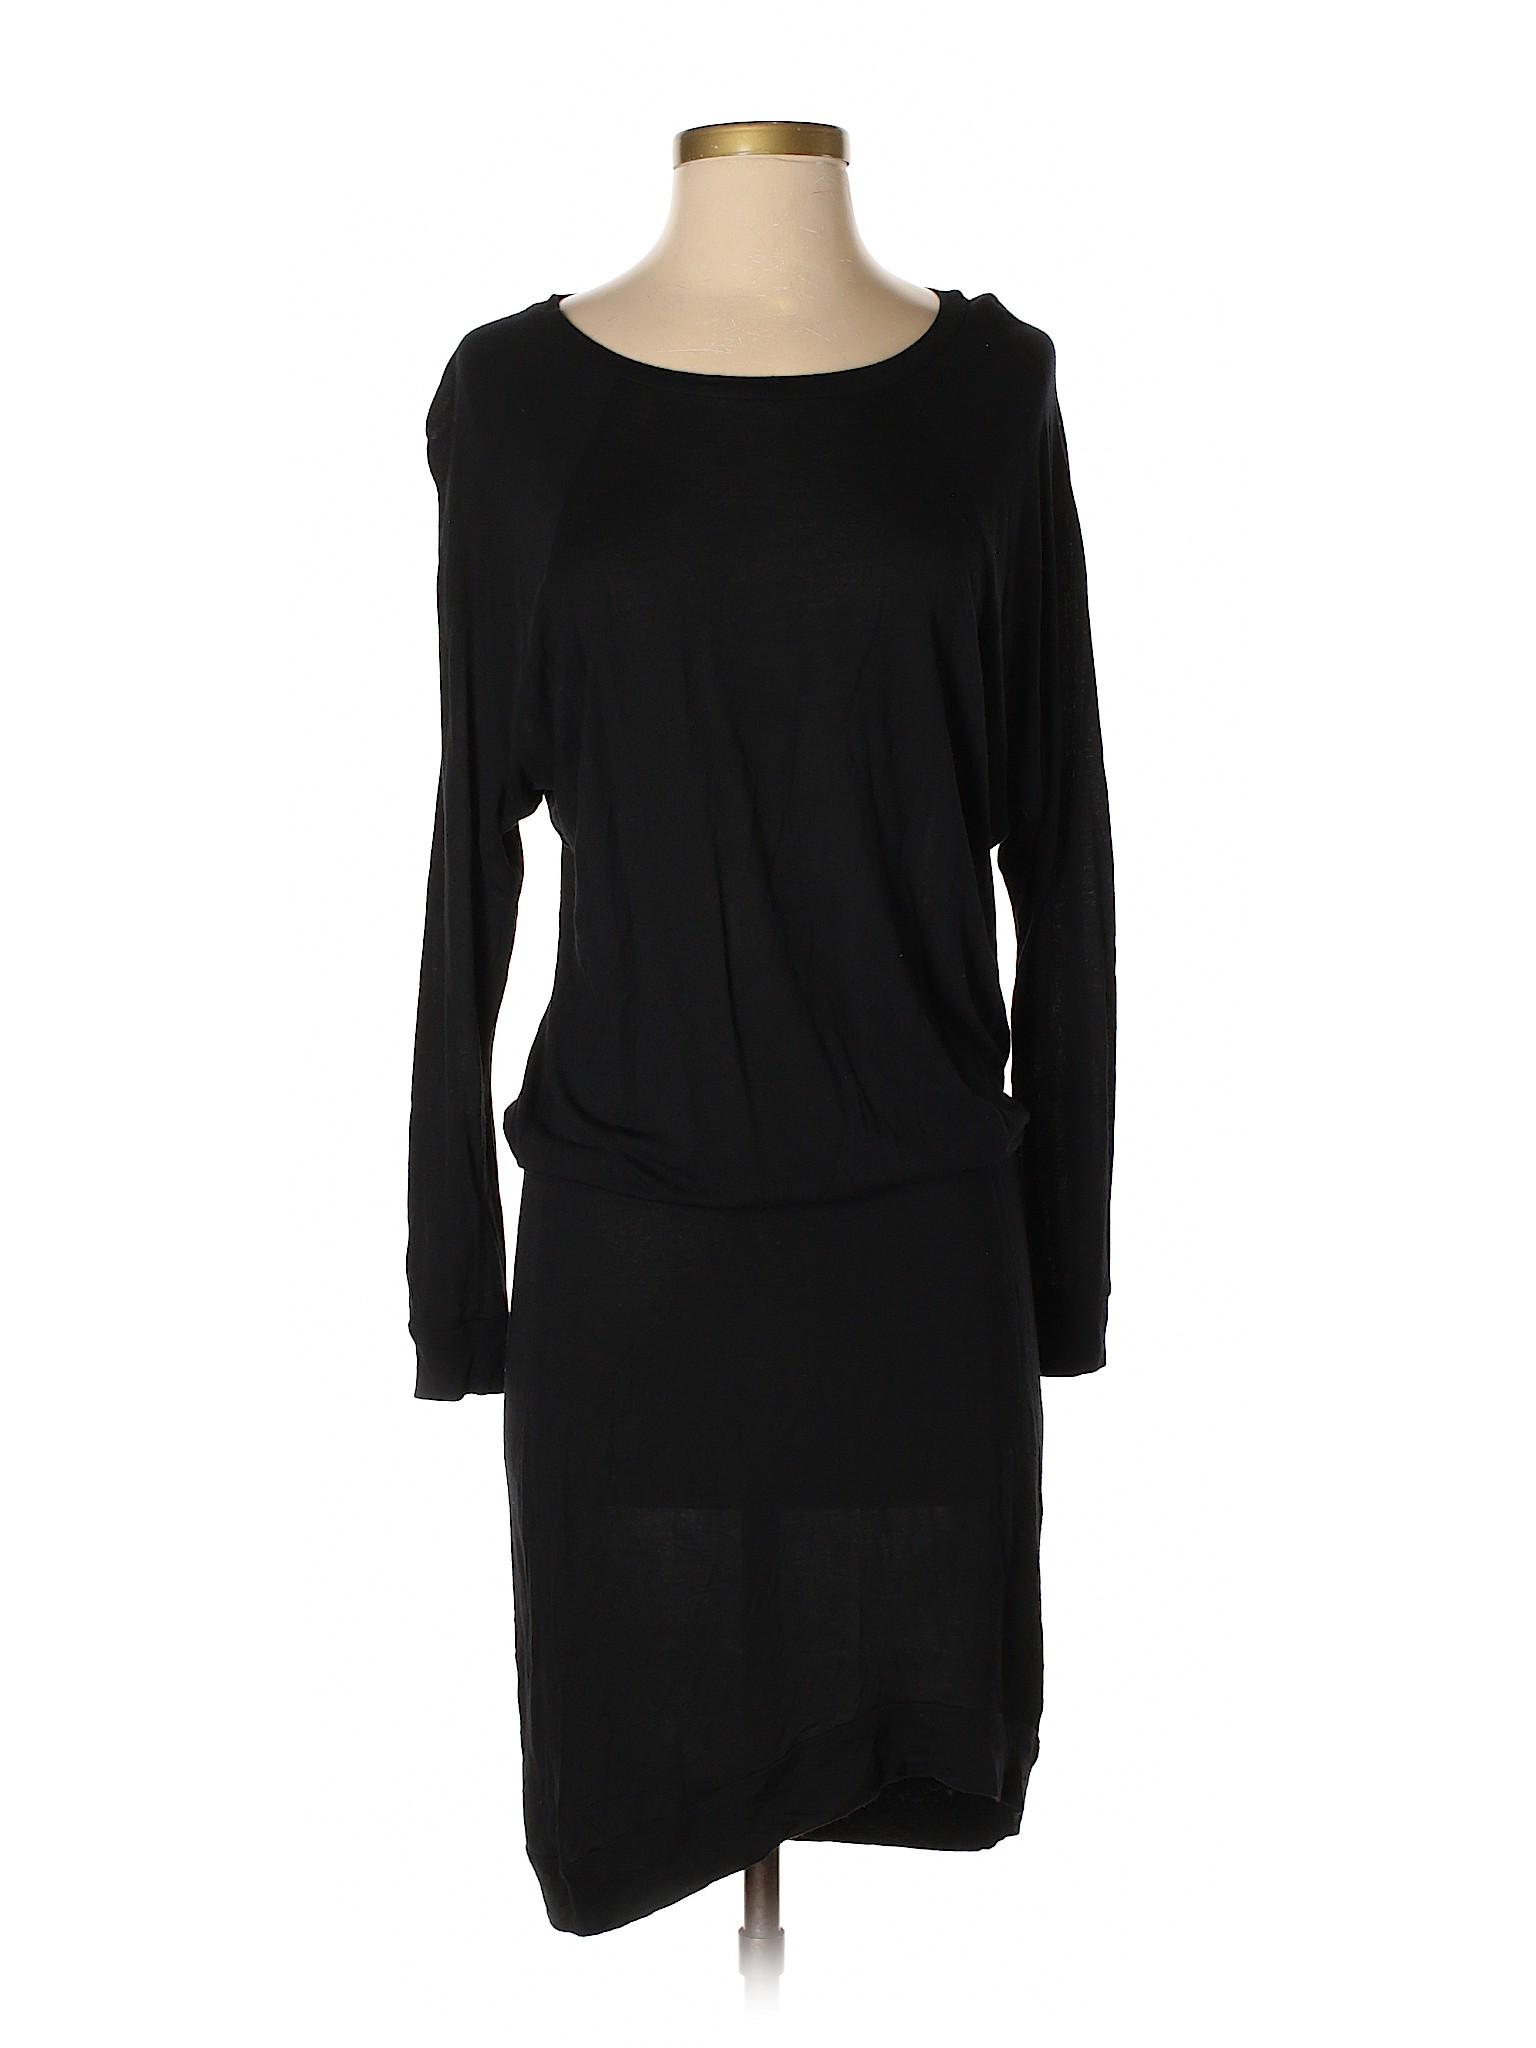 Dress Selling Casual LnA Selling LnA BIw5qUx7q